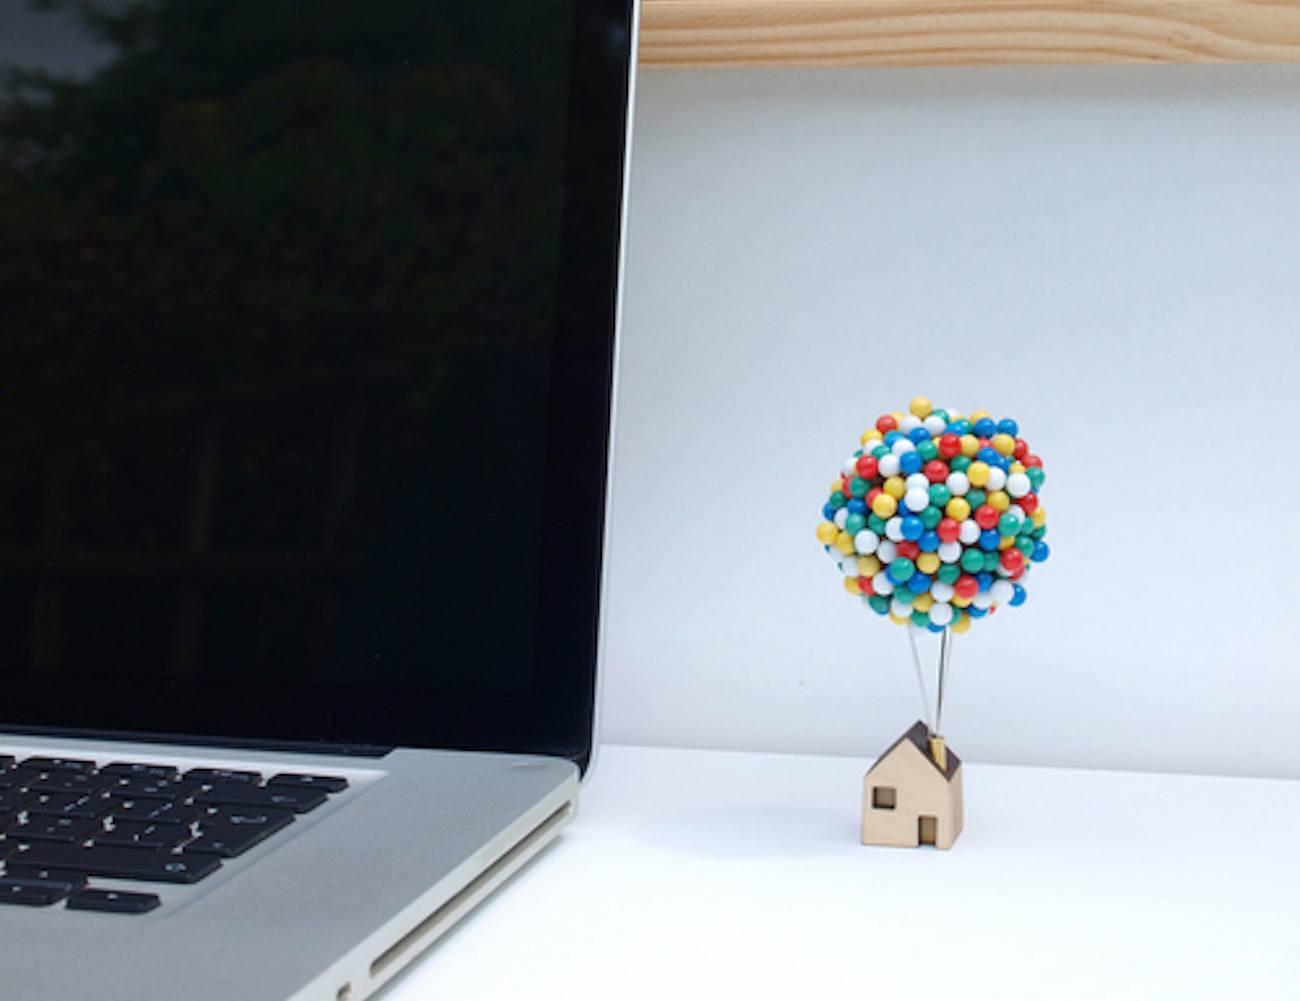 Balloon Pin House Pin Storage